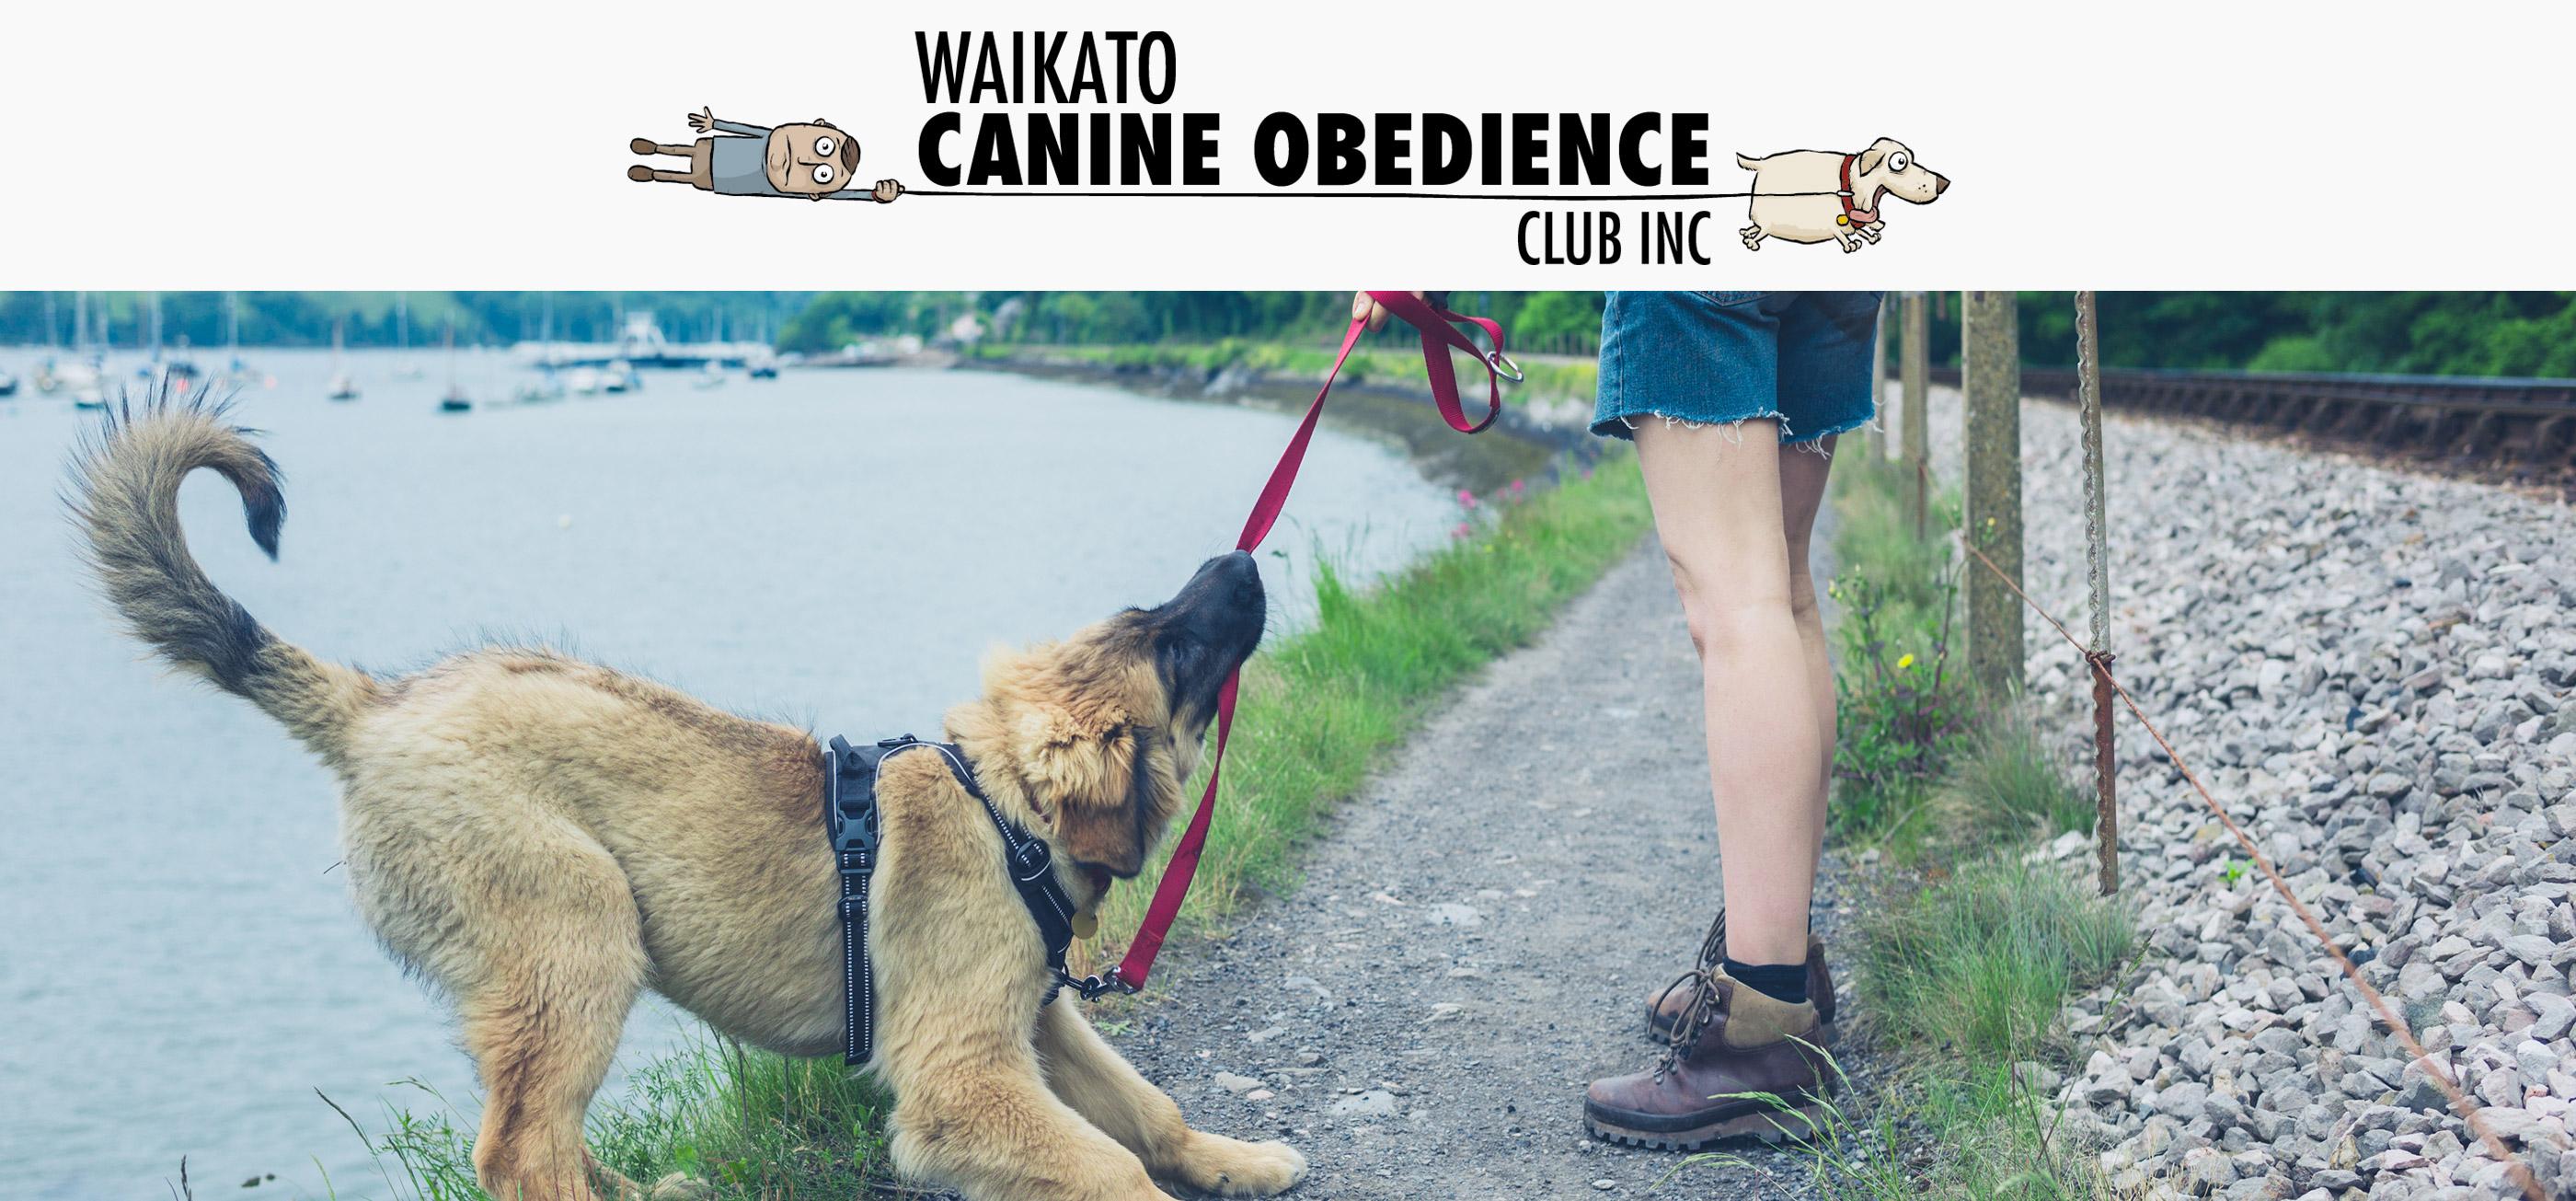 Waikato Canine Obedience Club